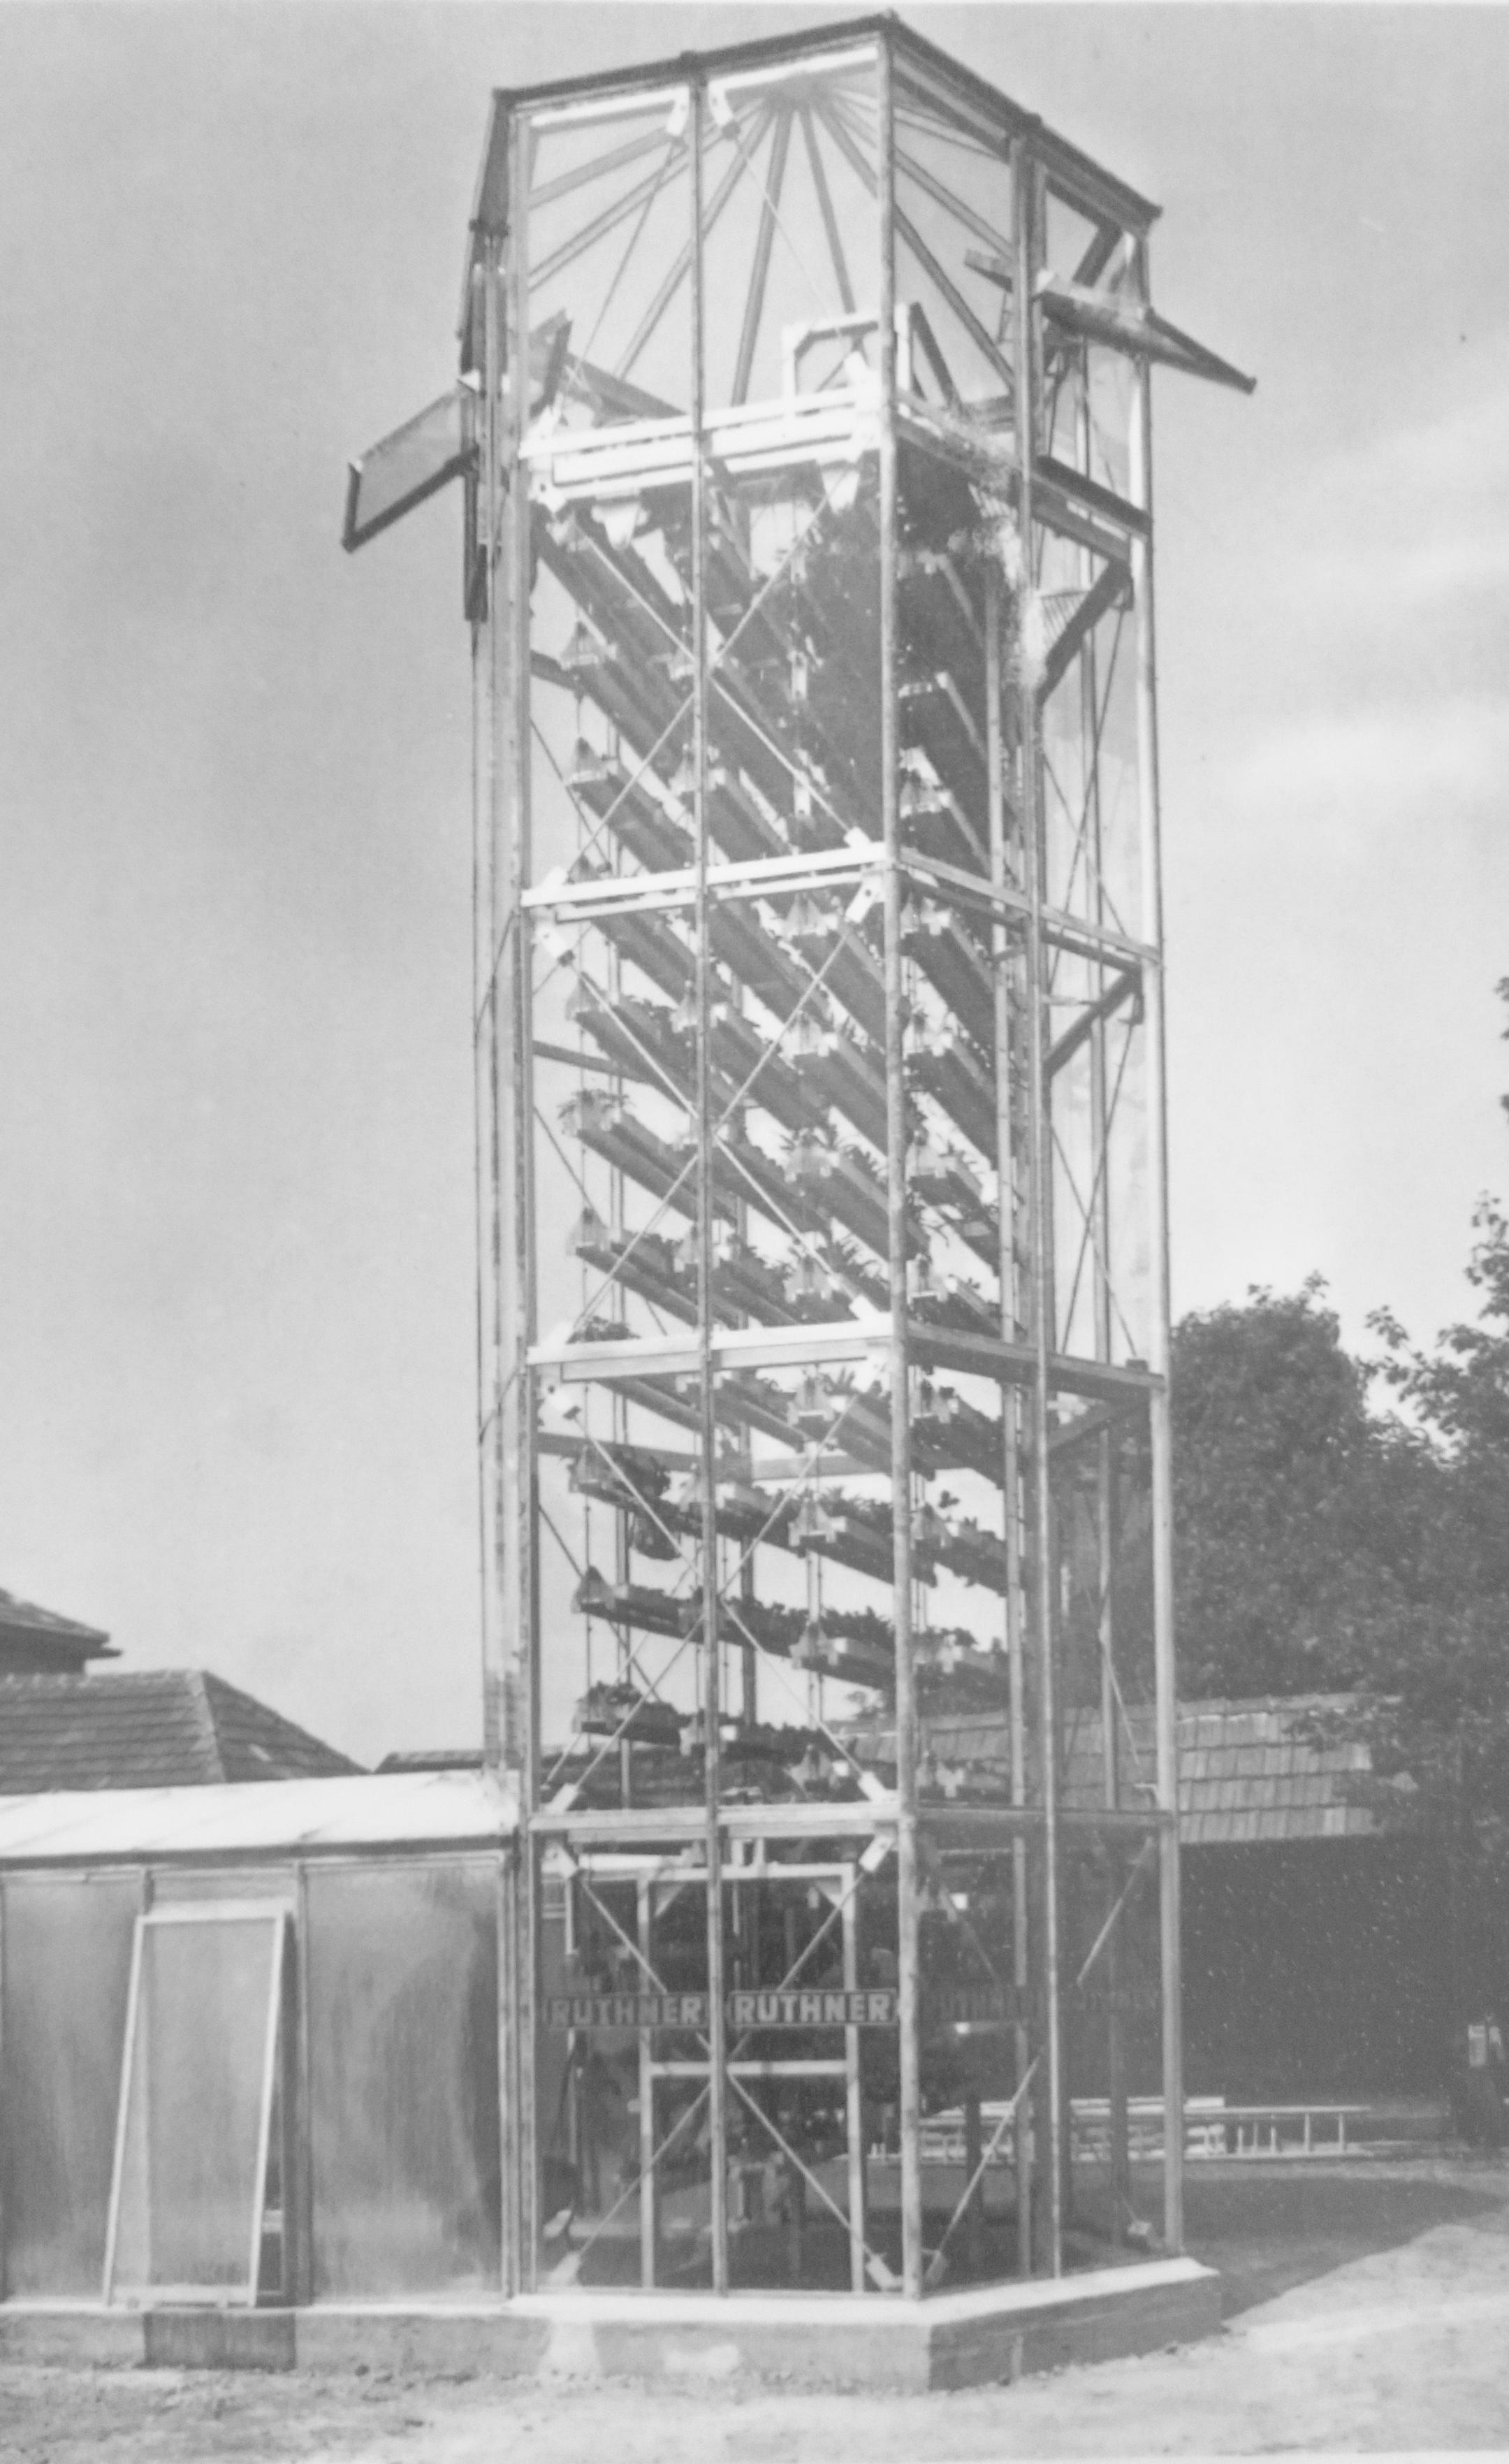 Pressephoto: Ruthner tower 1963, Langenlois (Copyright 1963: Stadt Wien, MA42)